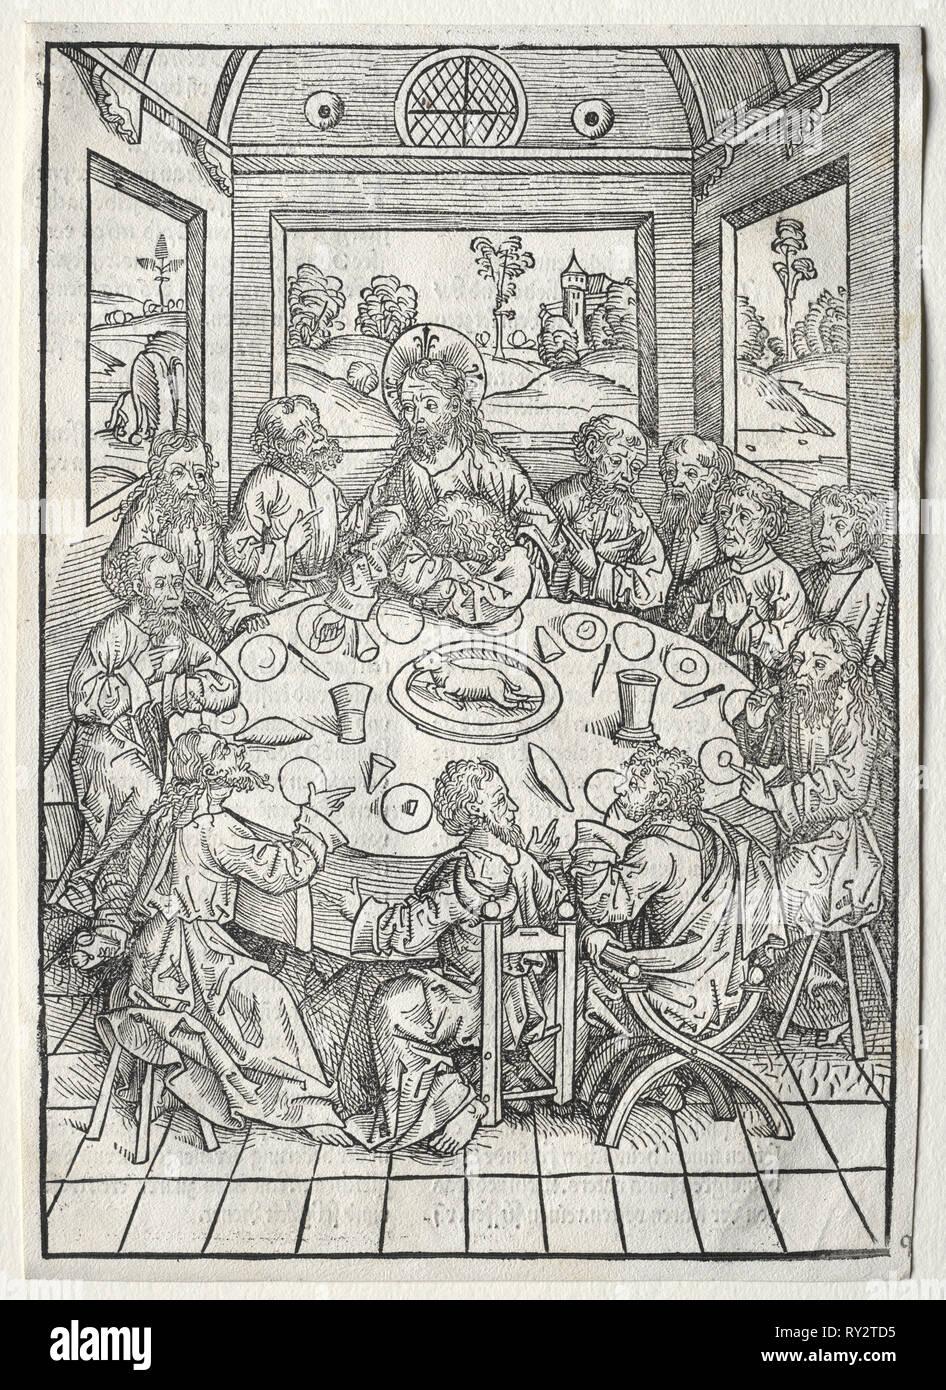 Der Schatzbehalter:  The Last Supper, 1491. Michael Wolgemut (German, 1434-1519). Woodcut - Stock Image